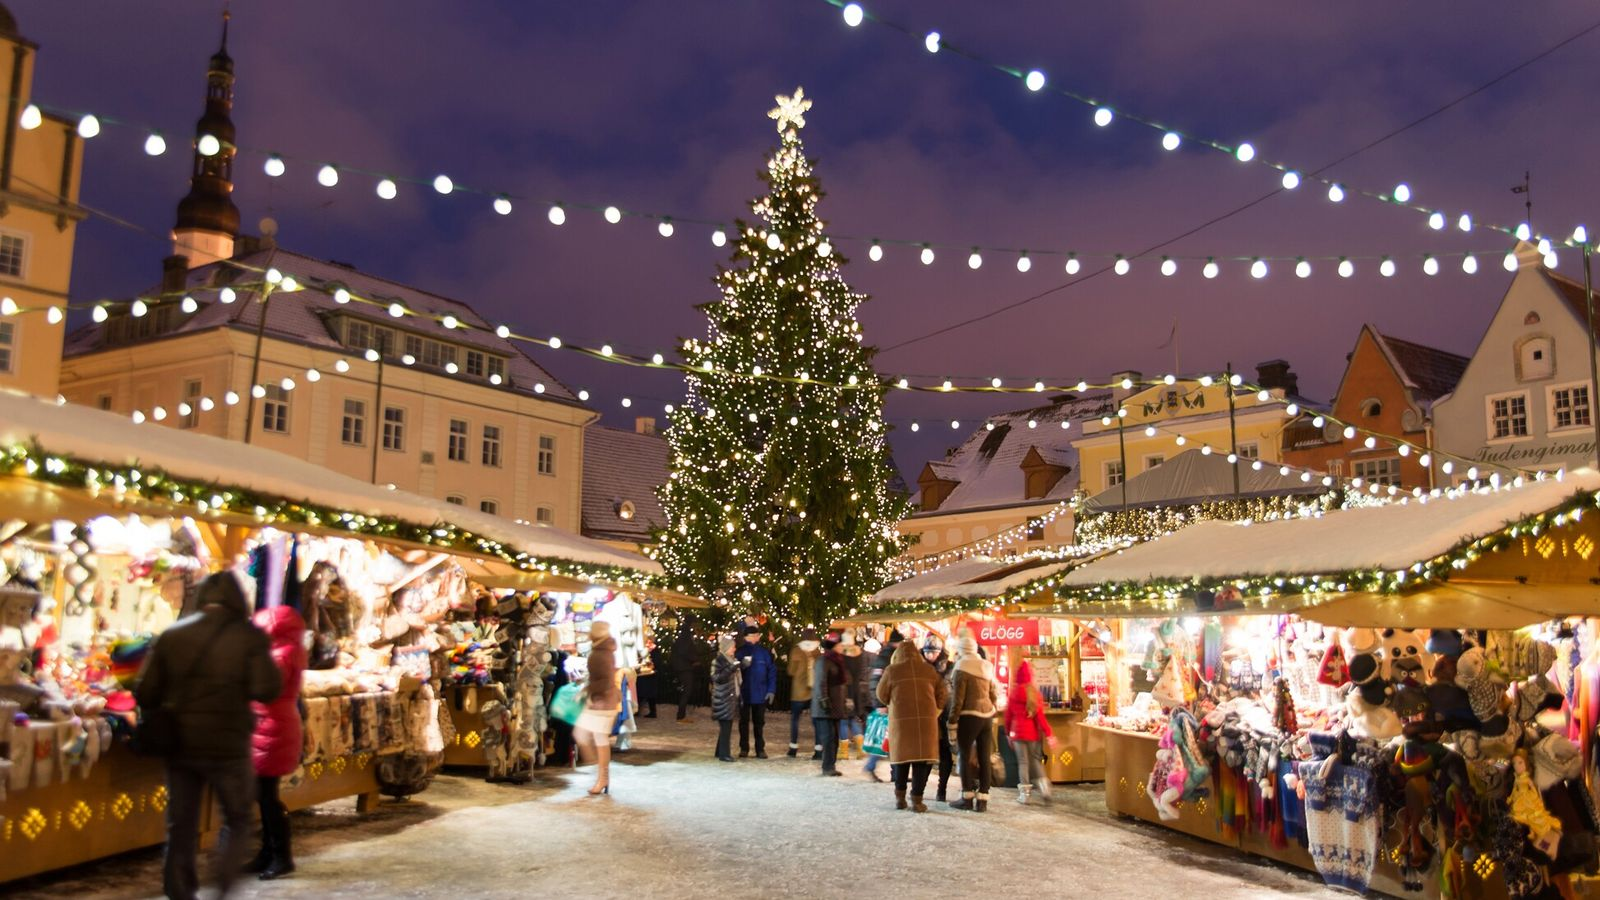 A holiday market in Estonia's capital Tallinn features a large Christmas tree. Both Latvia and Estonia ...